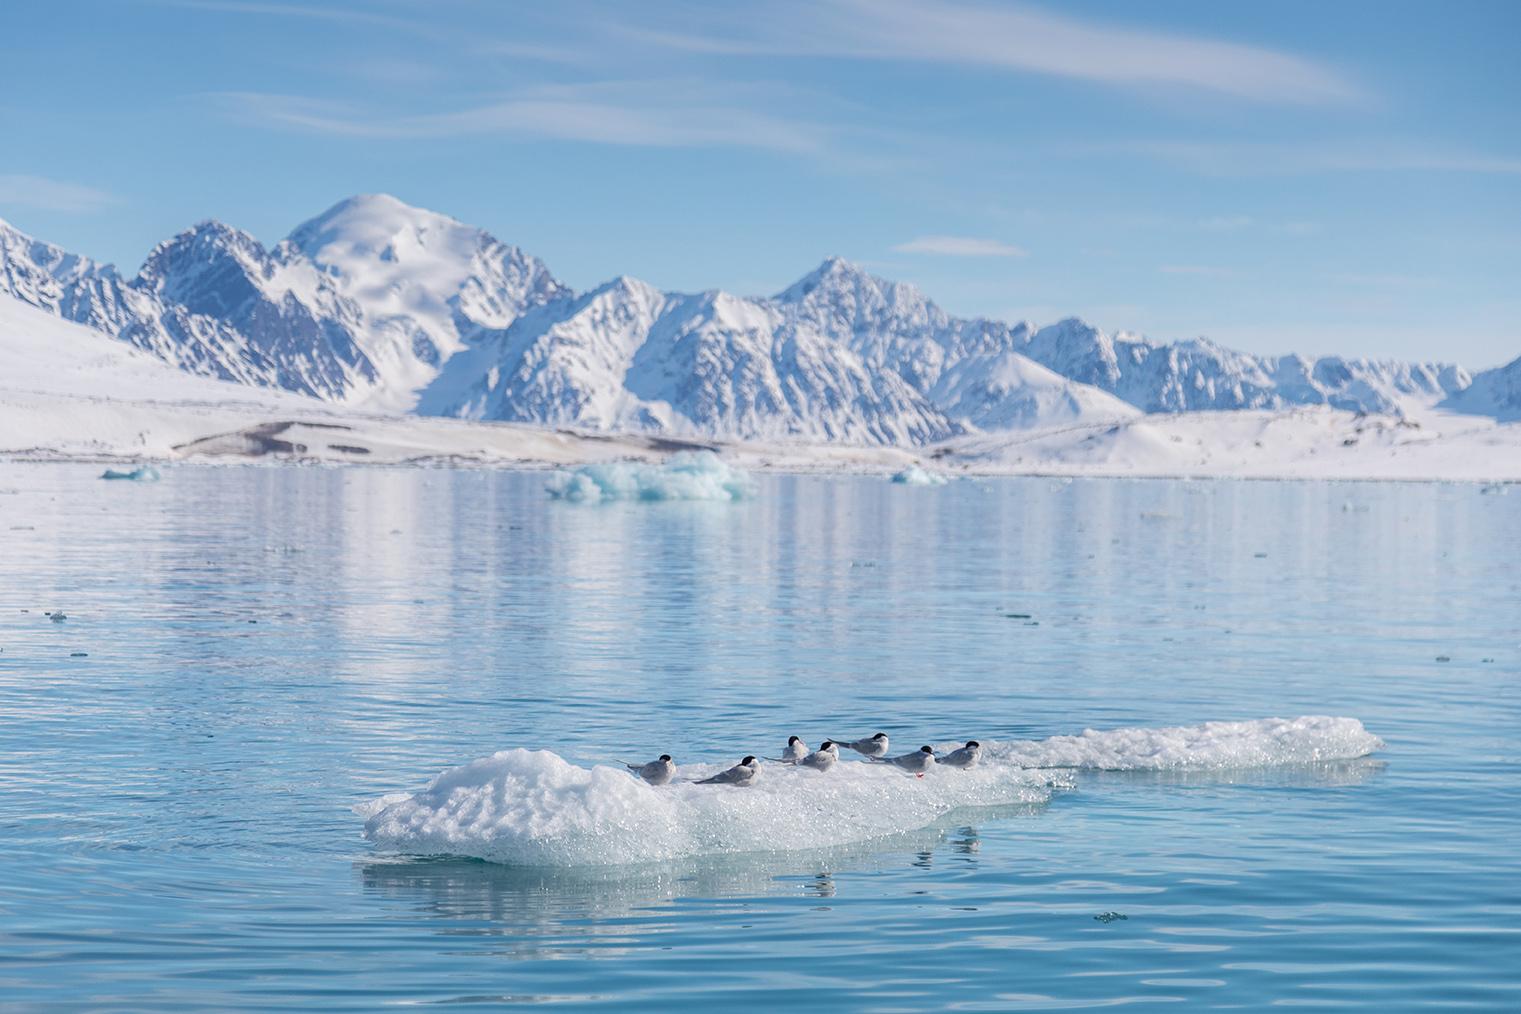 Arctic terns are often seen along the coastal areas of the Norwegian Arctic archipelago of Svalbard